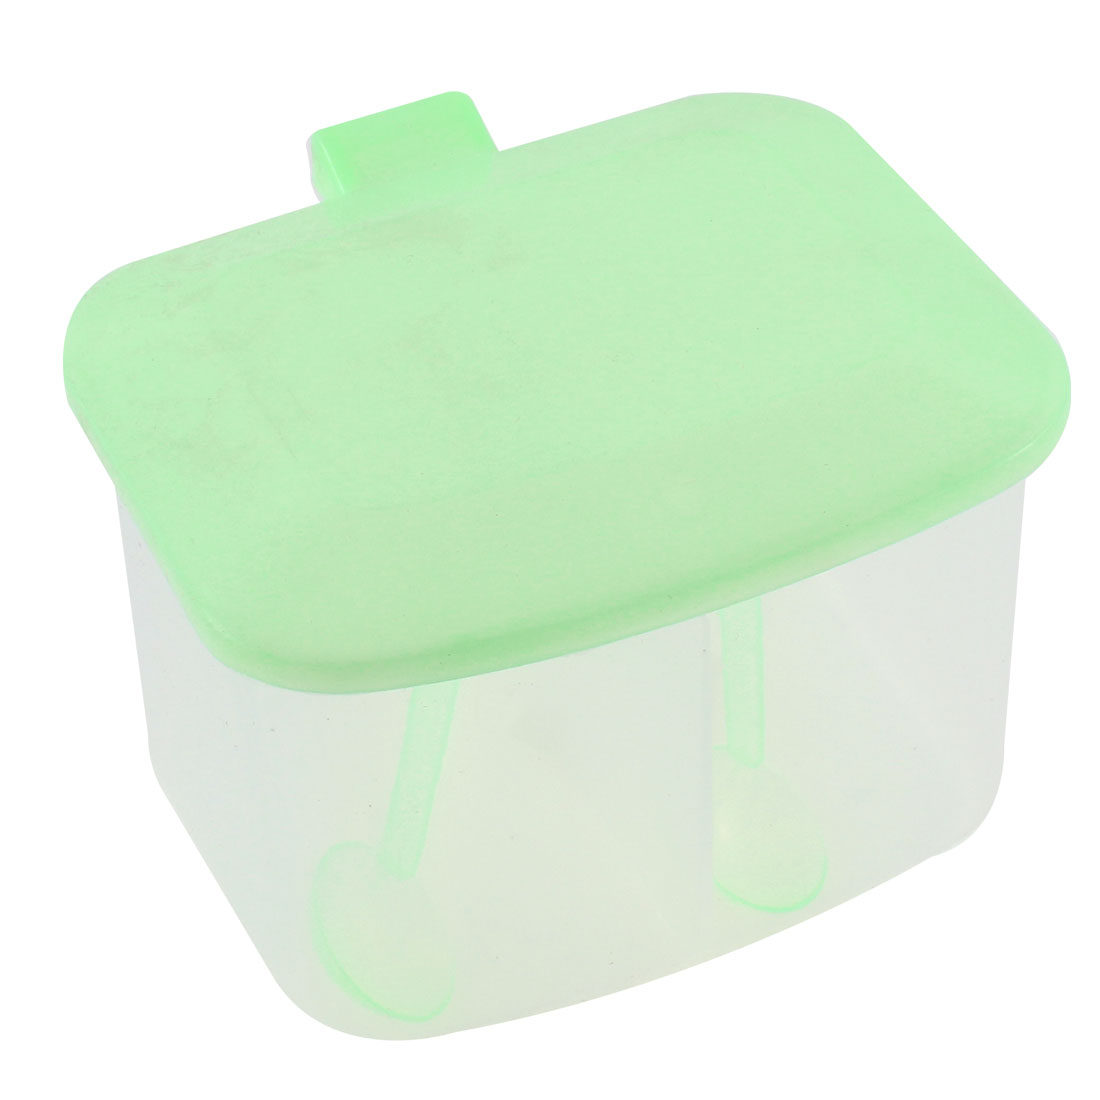 Kitchen Plastic 2 Compartment Salt Condiment Spices Container Case Green